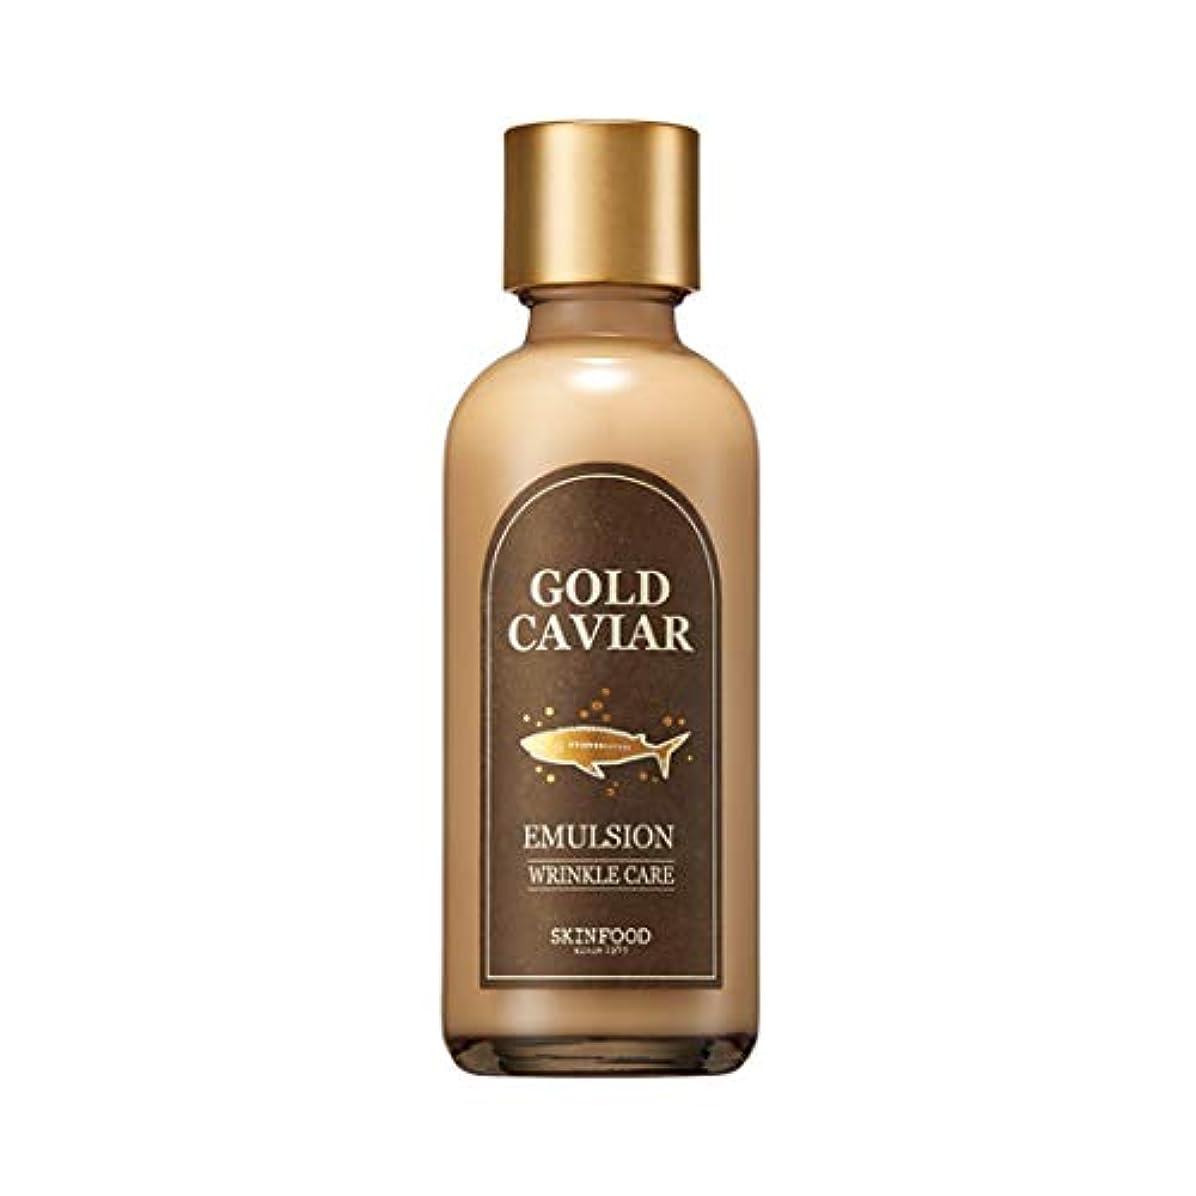 Skinfood ゴールドキャビアエマルジョン(しわケア用化粧品) / Gold Caviar Emulsion (Cosmeceutical for wrinkle care) 160ml [並行輸入品]